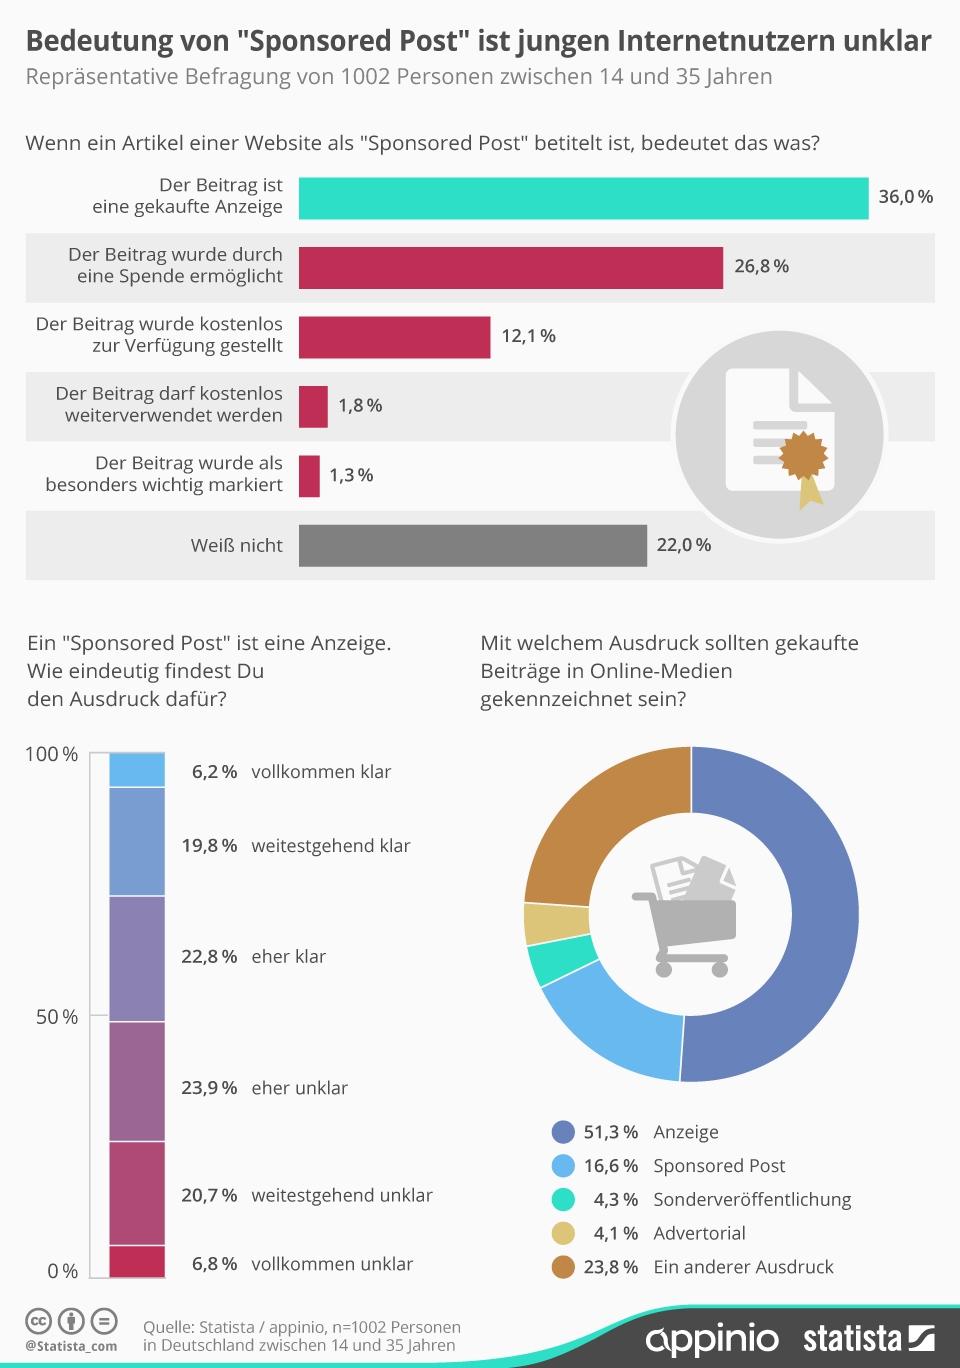 Infografik: Bedeutung des Ausdrucks